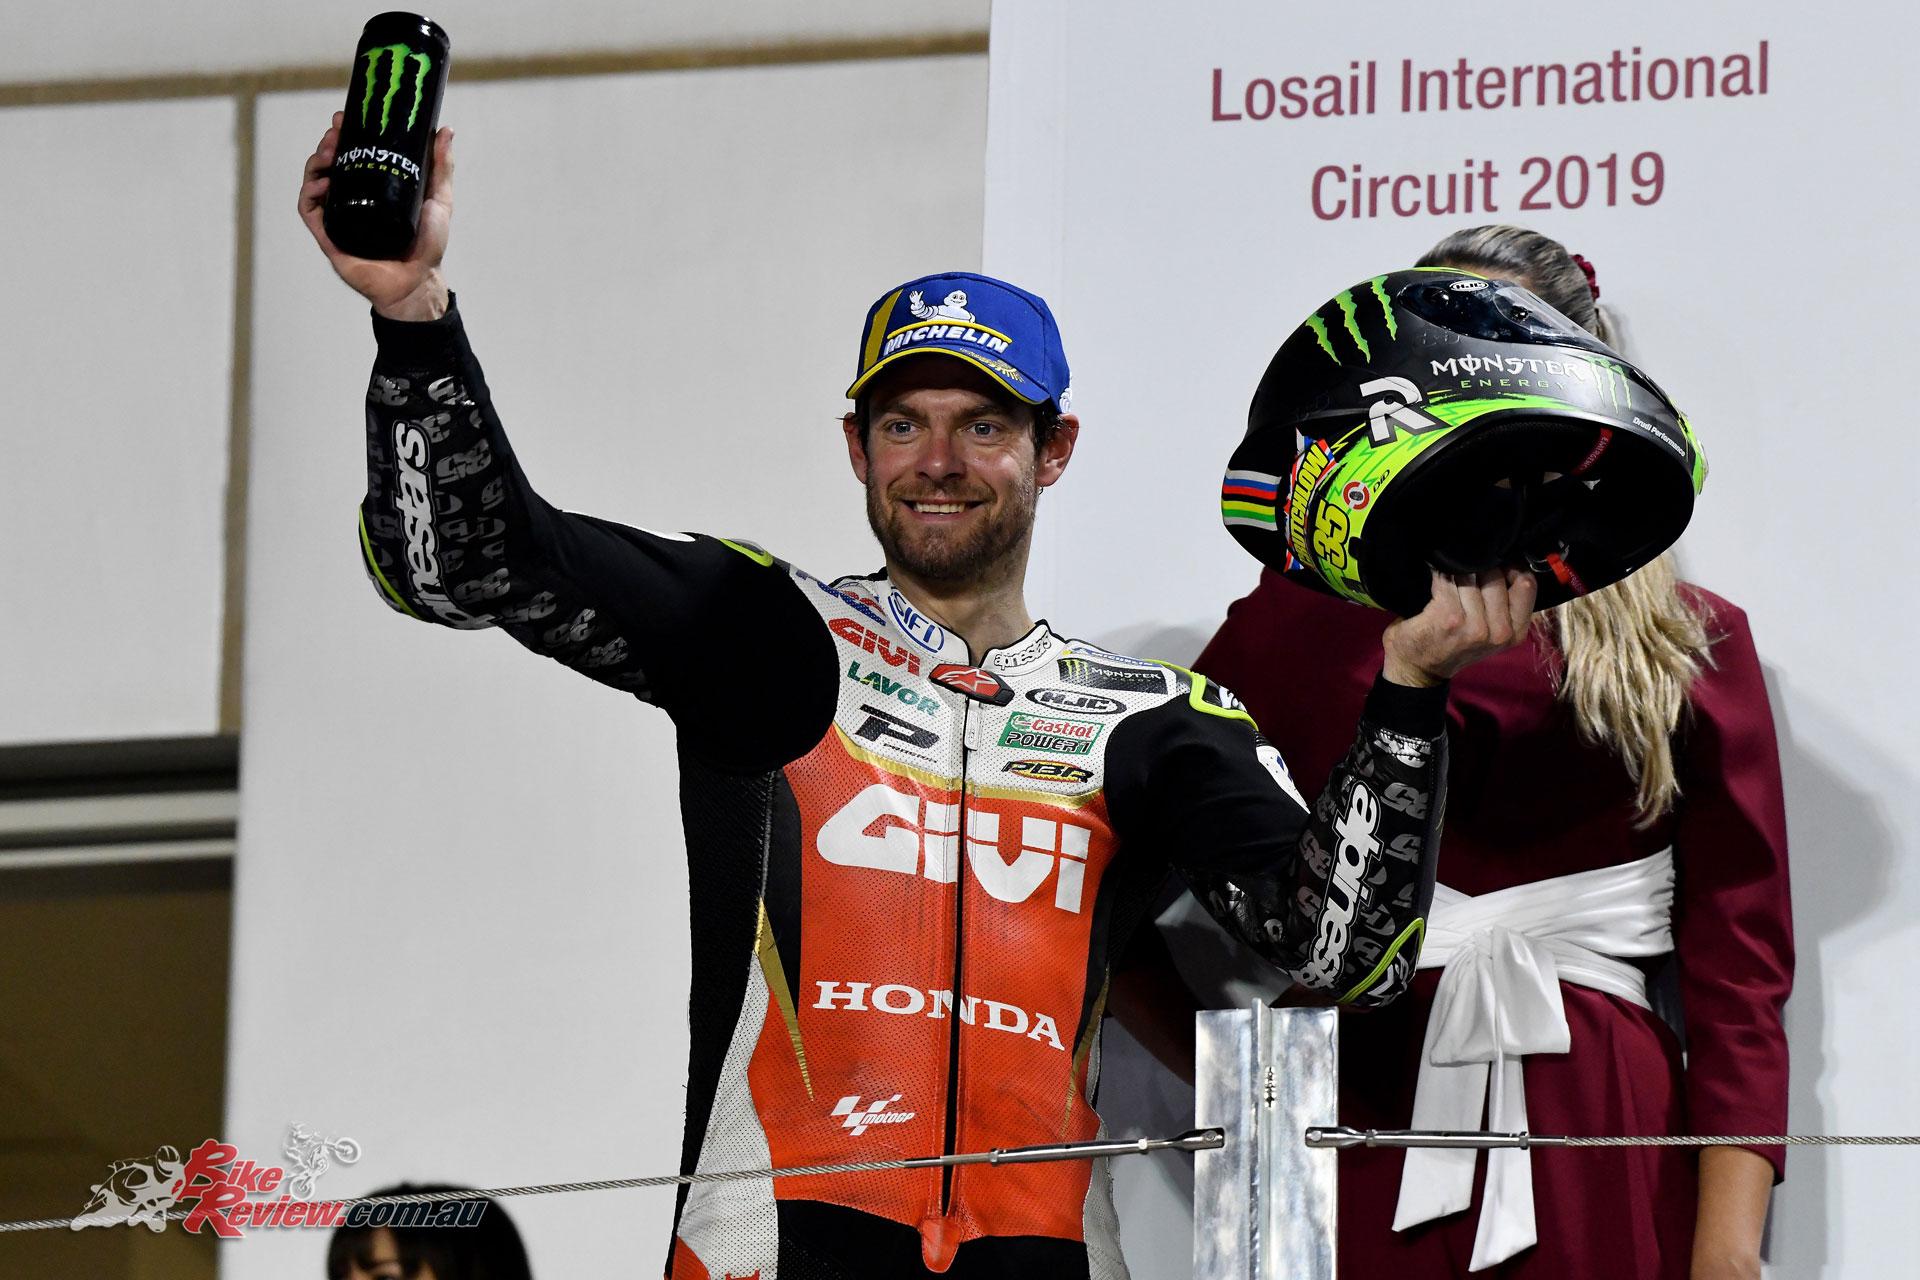 Cal Crutchlow - Qatar MotoGP - Round 1, 2019